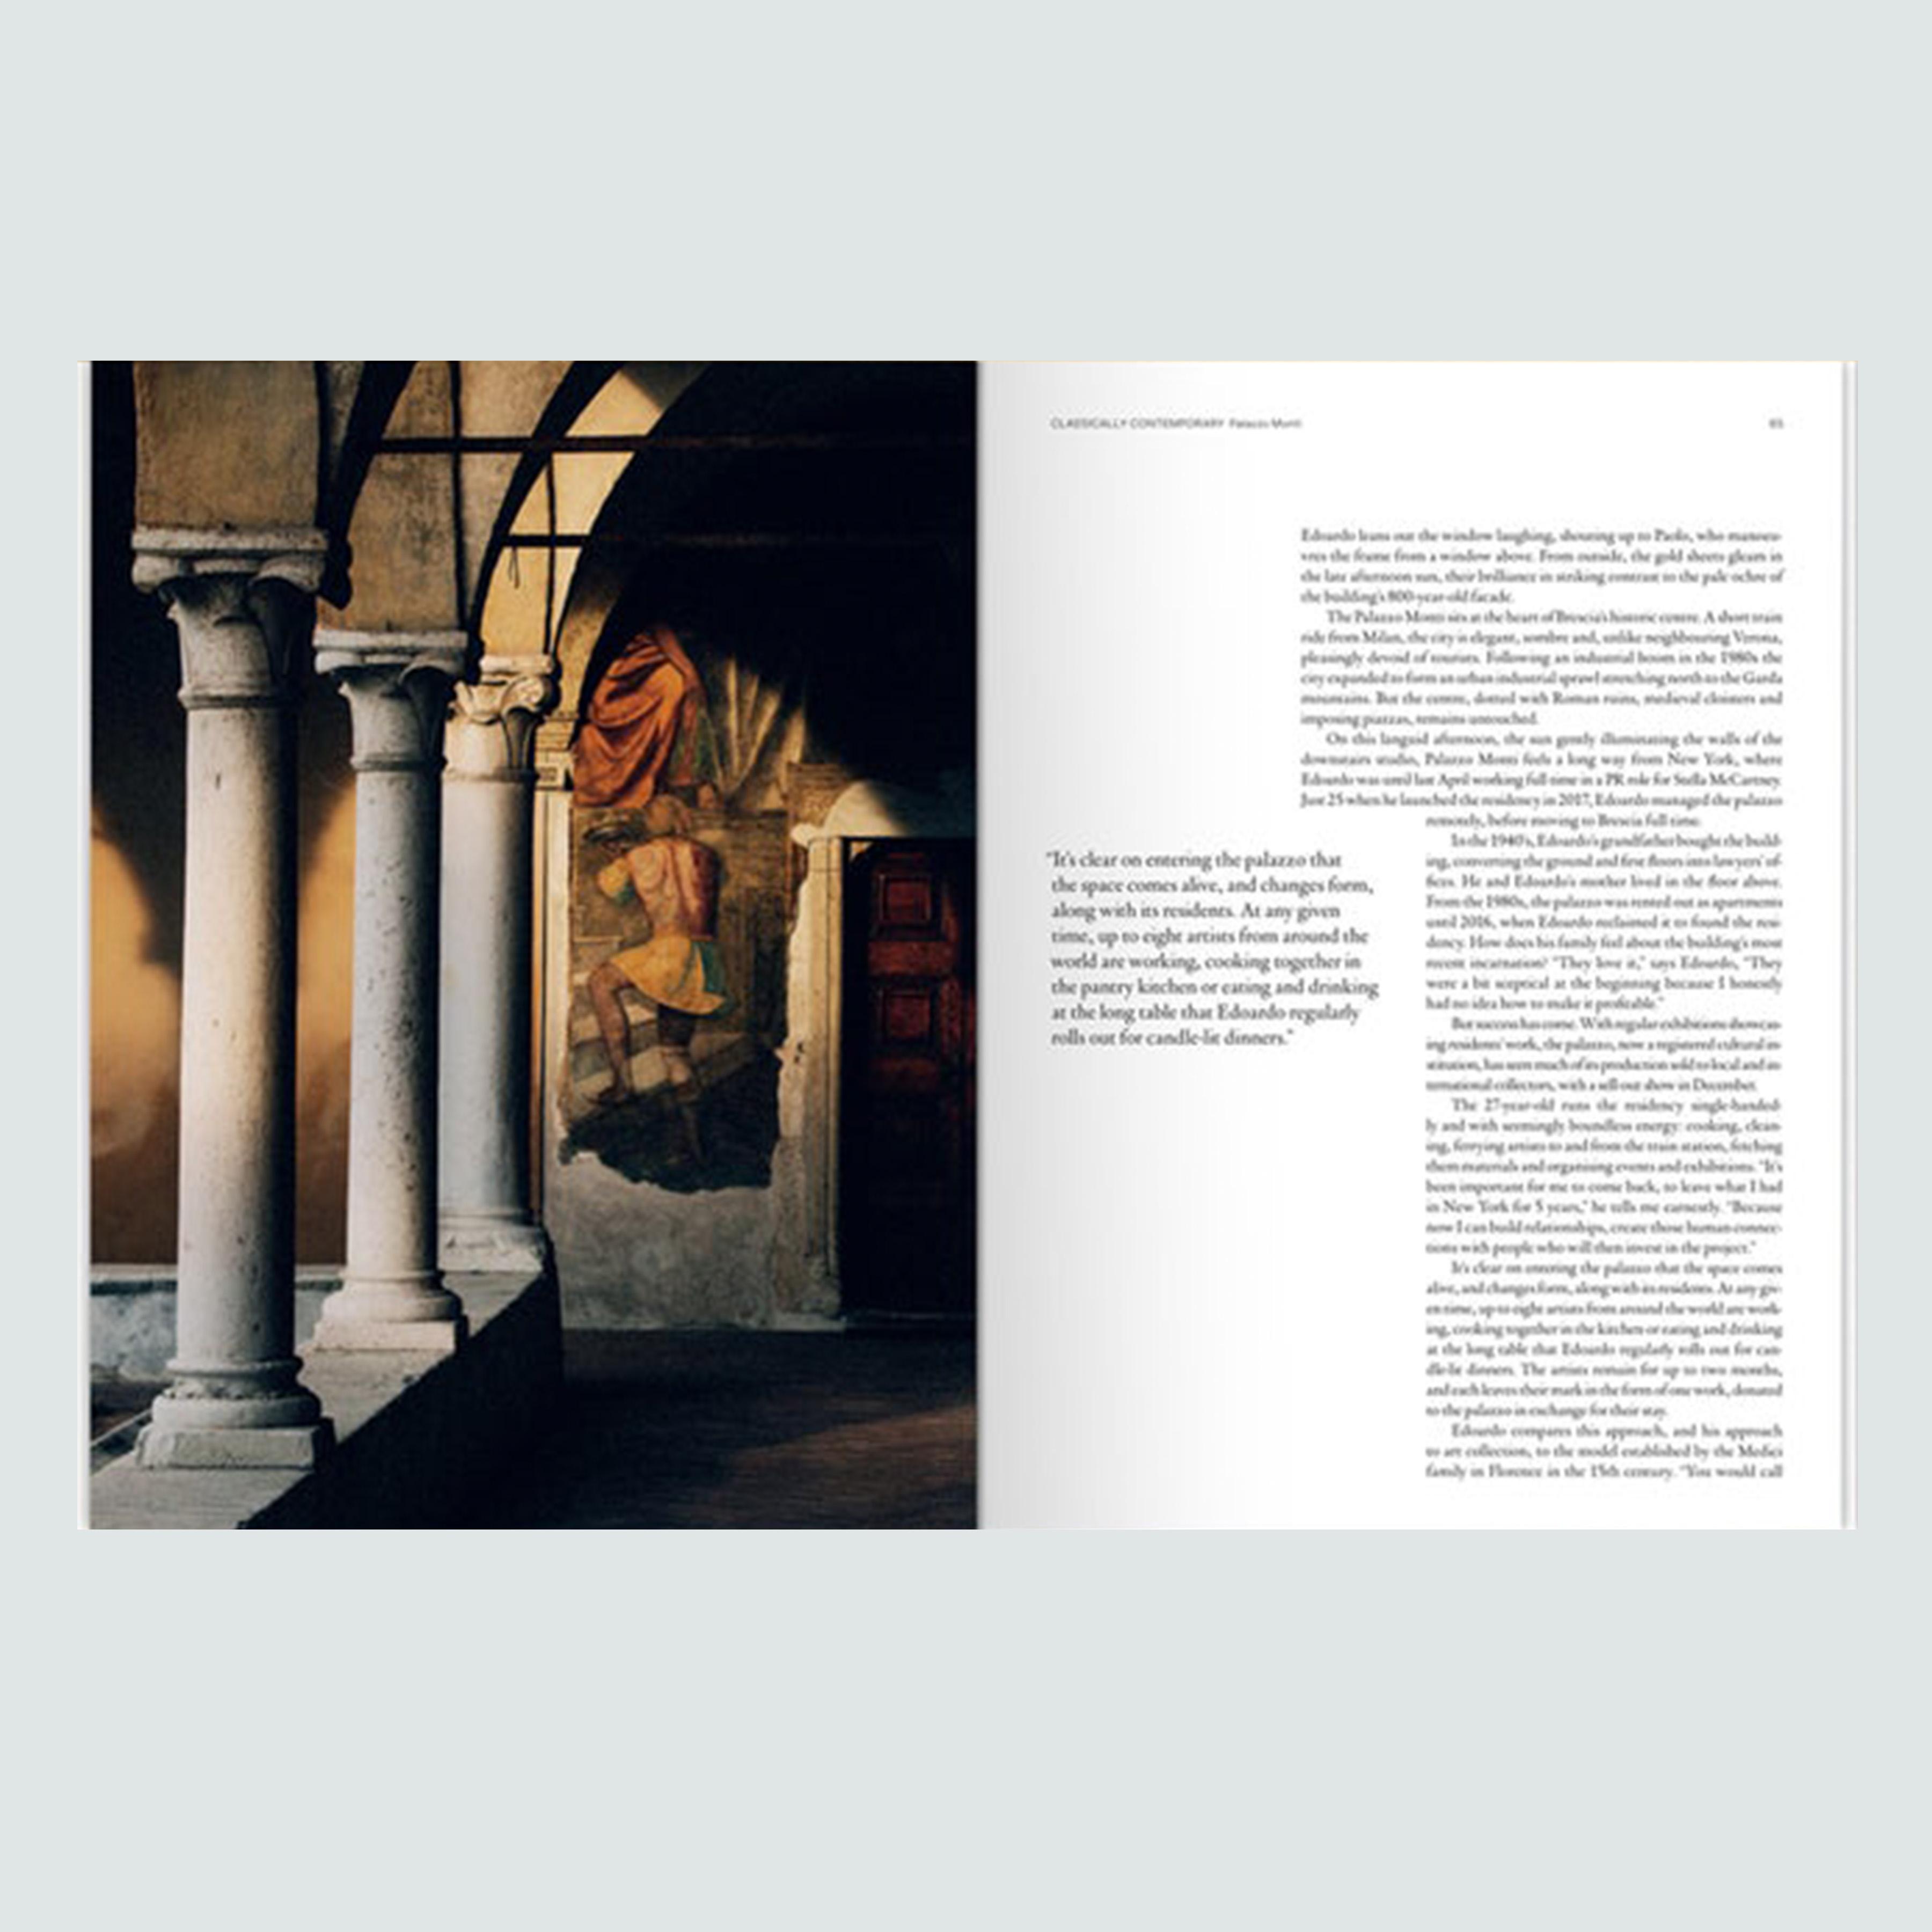 ISSUE N.11